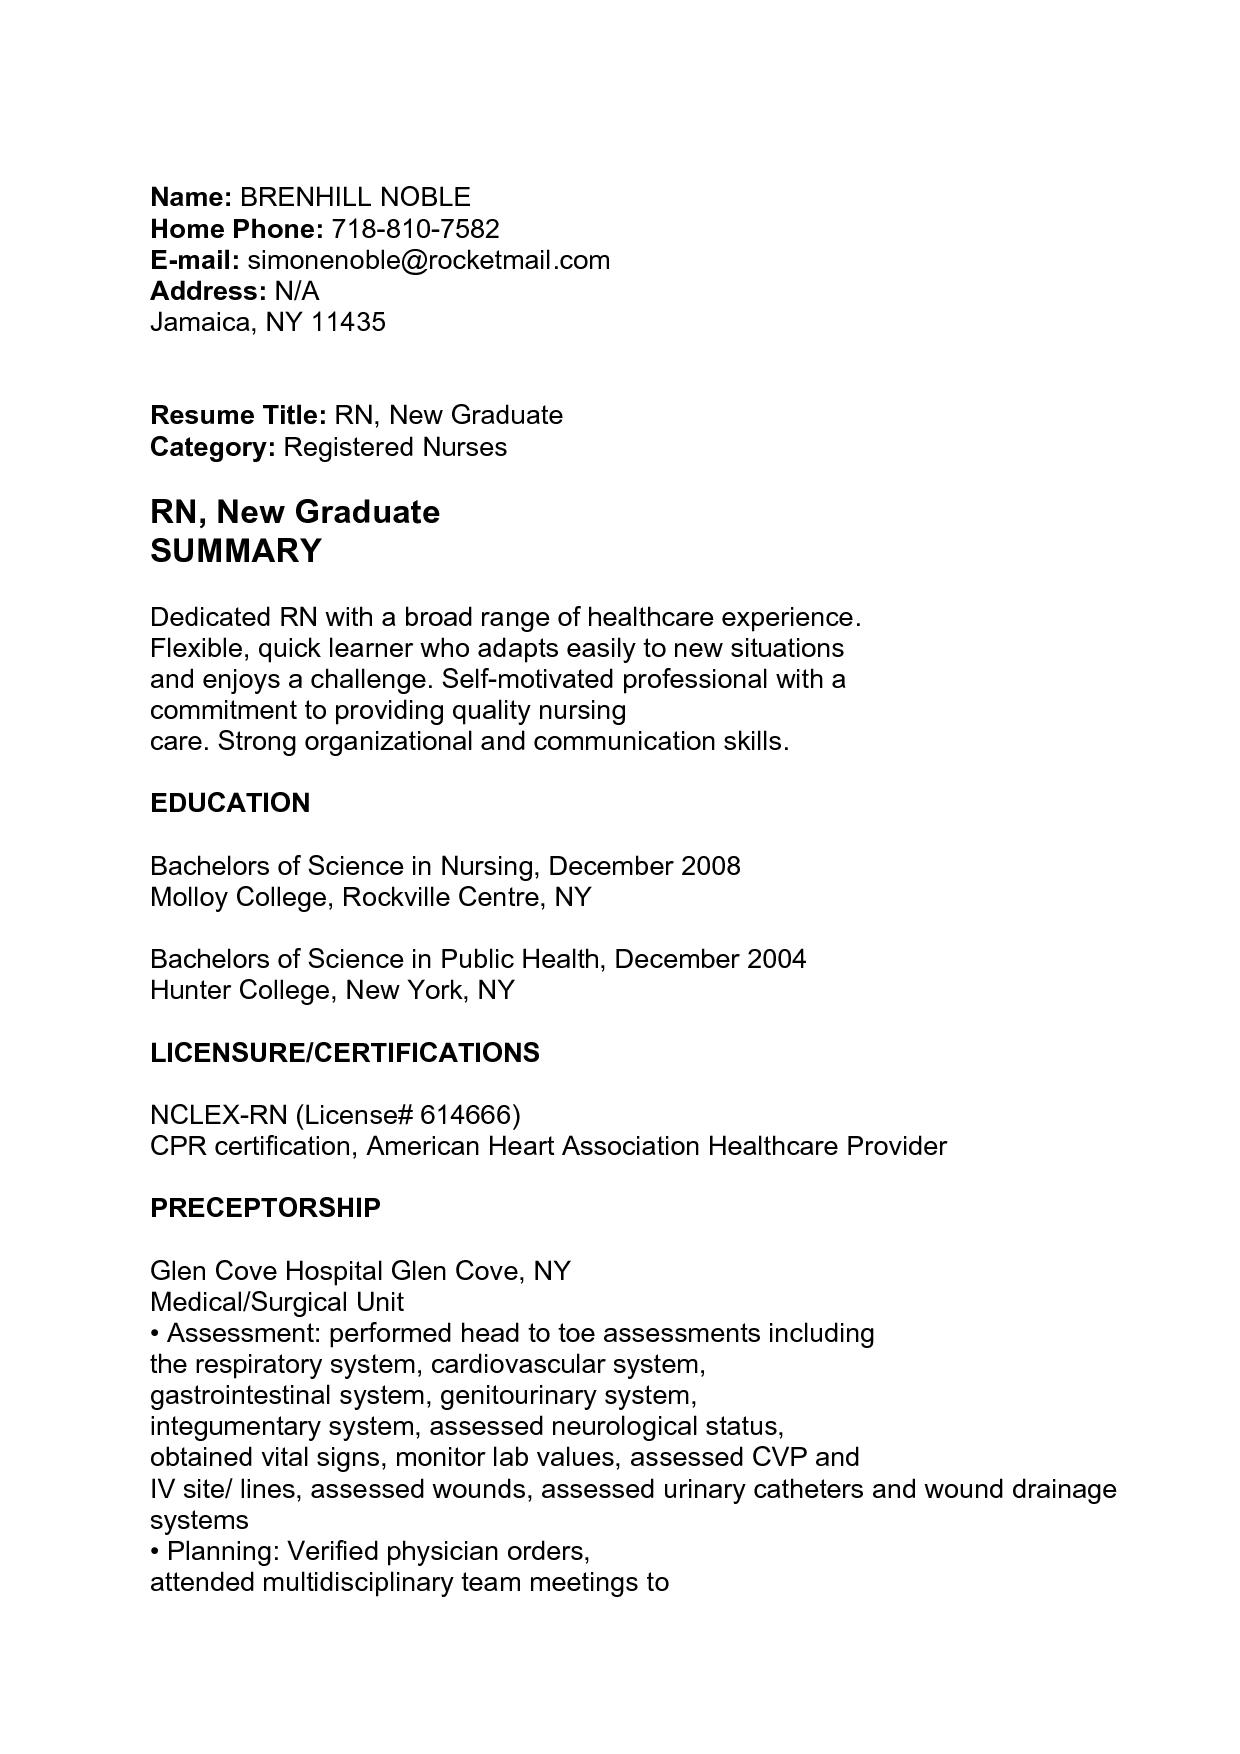 Triage Nurse Cover Letter | Objective Resume Public Health Nurse ...